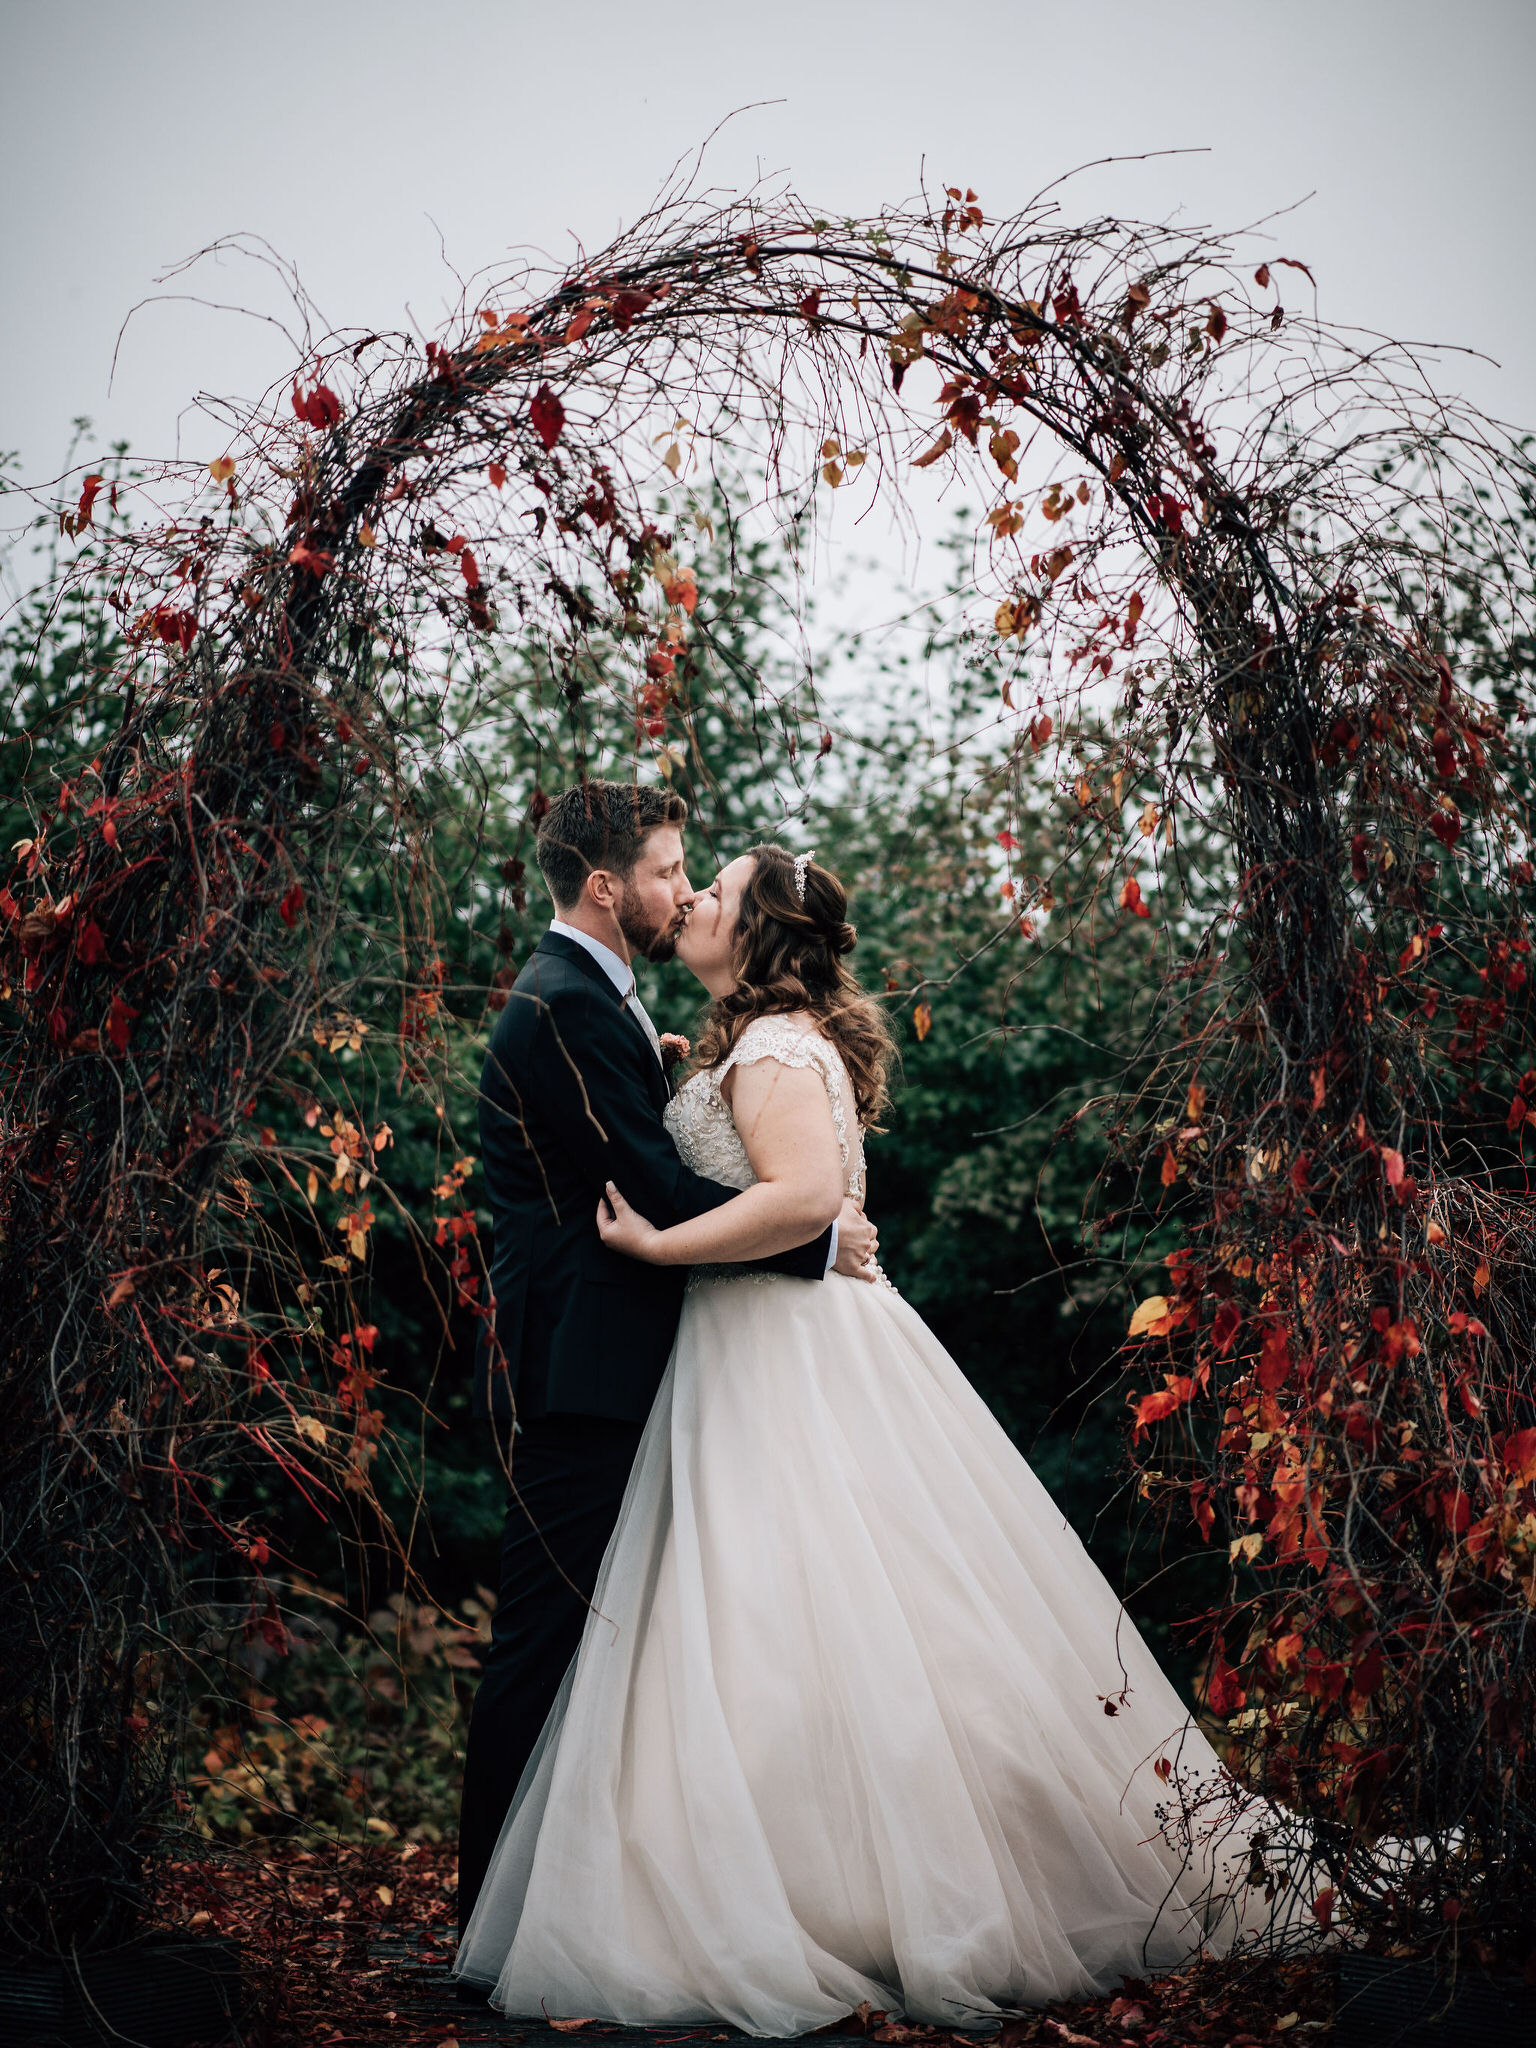 _N858059_fotografering_larvik_bryllup_aspargesgarden_.jpg